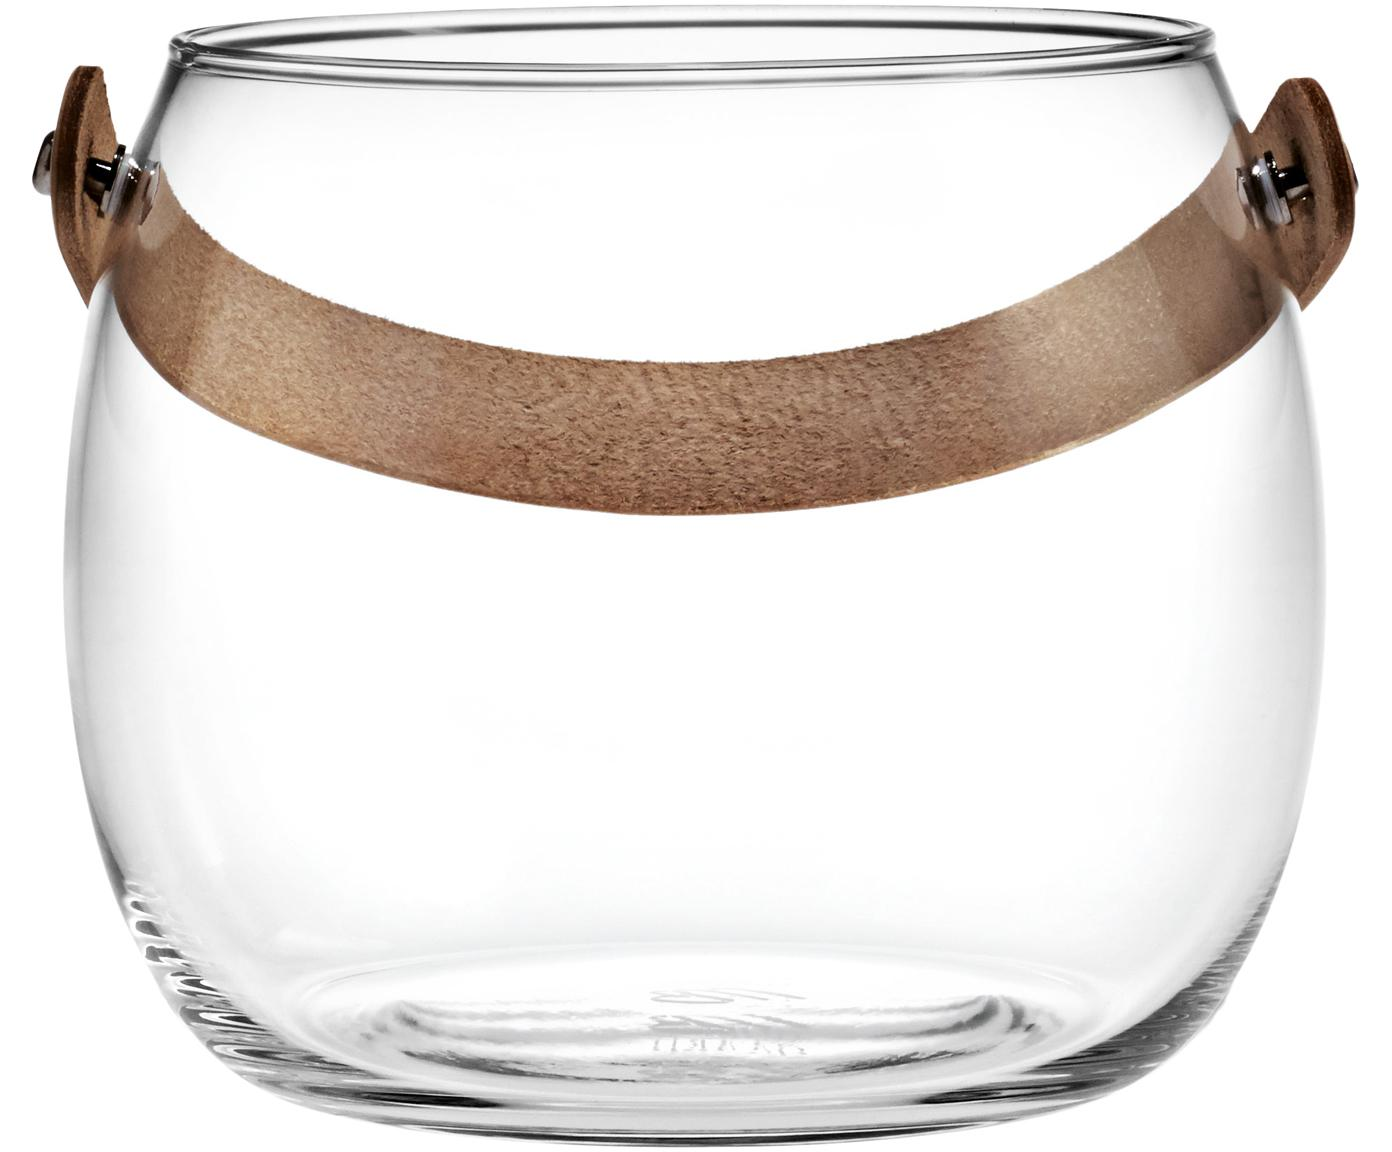 Portacandela Chamber, Manico: pelle, Trasparente, marrone, Ø 16 x Alt. 12 cm